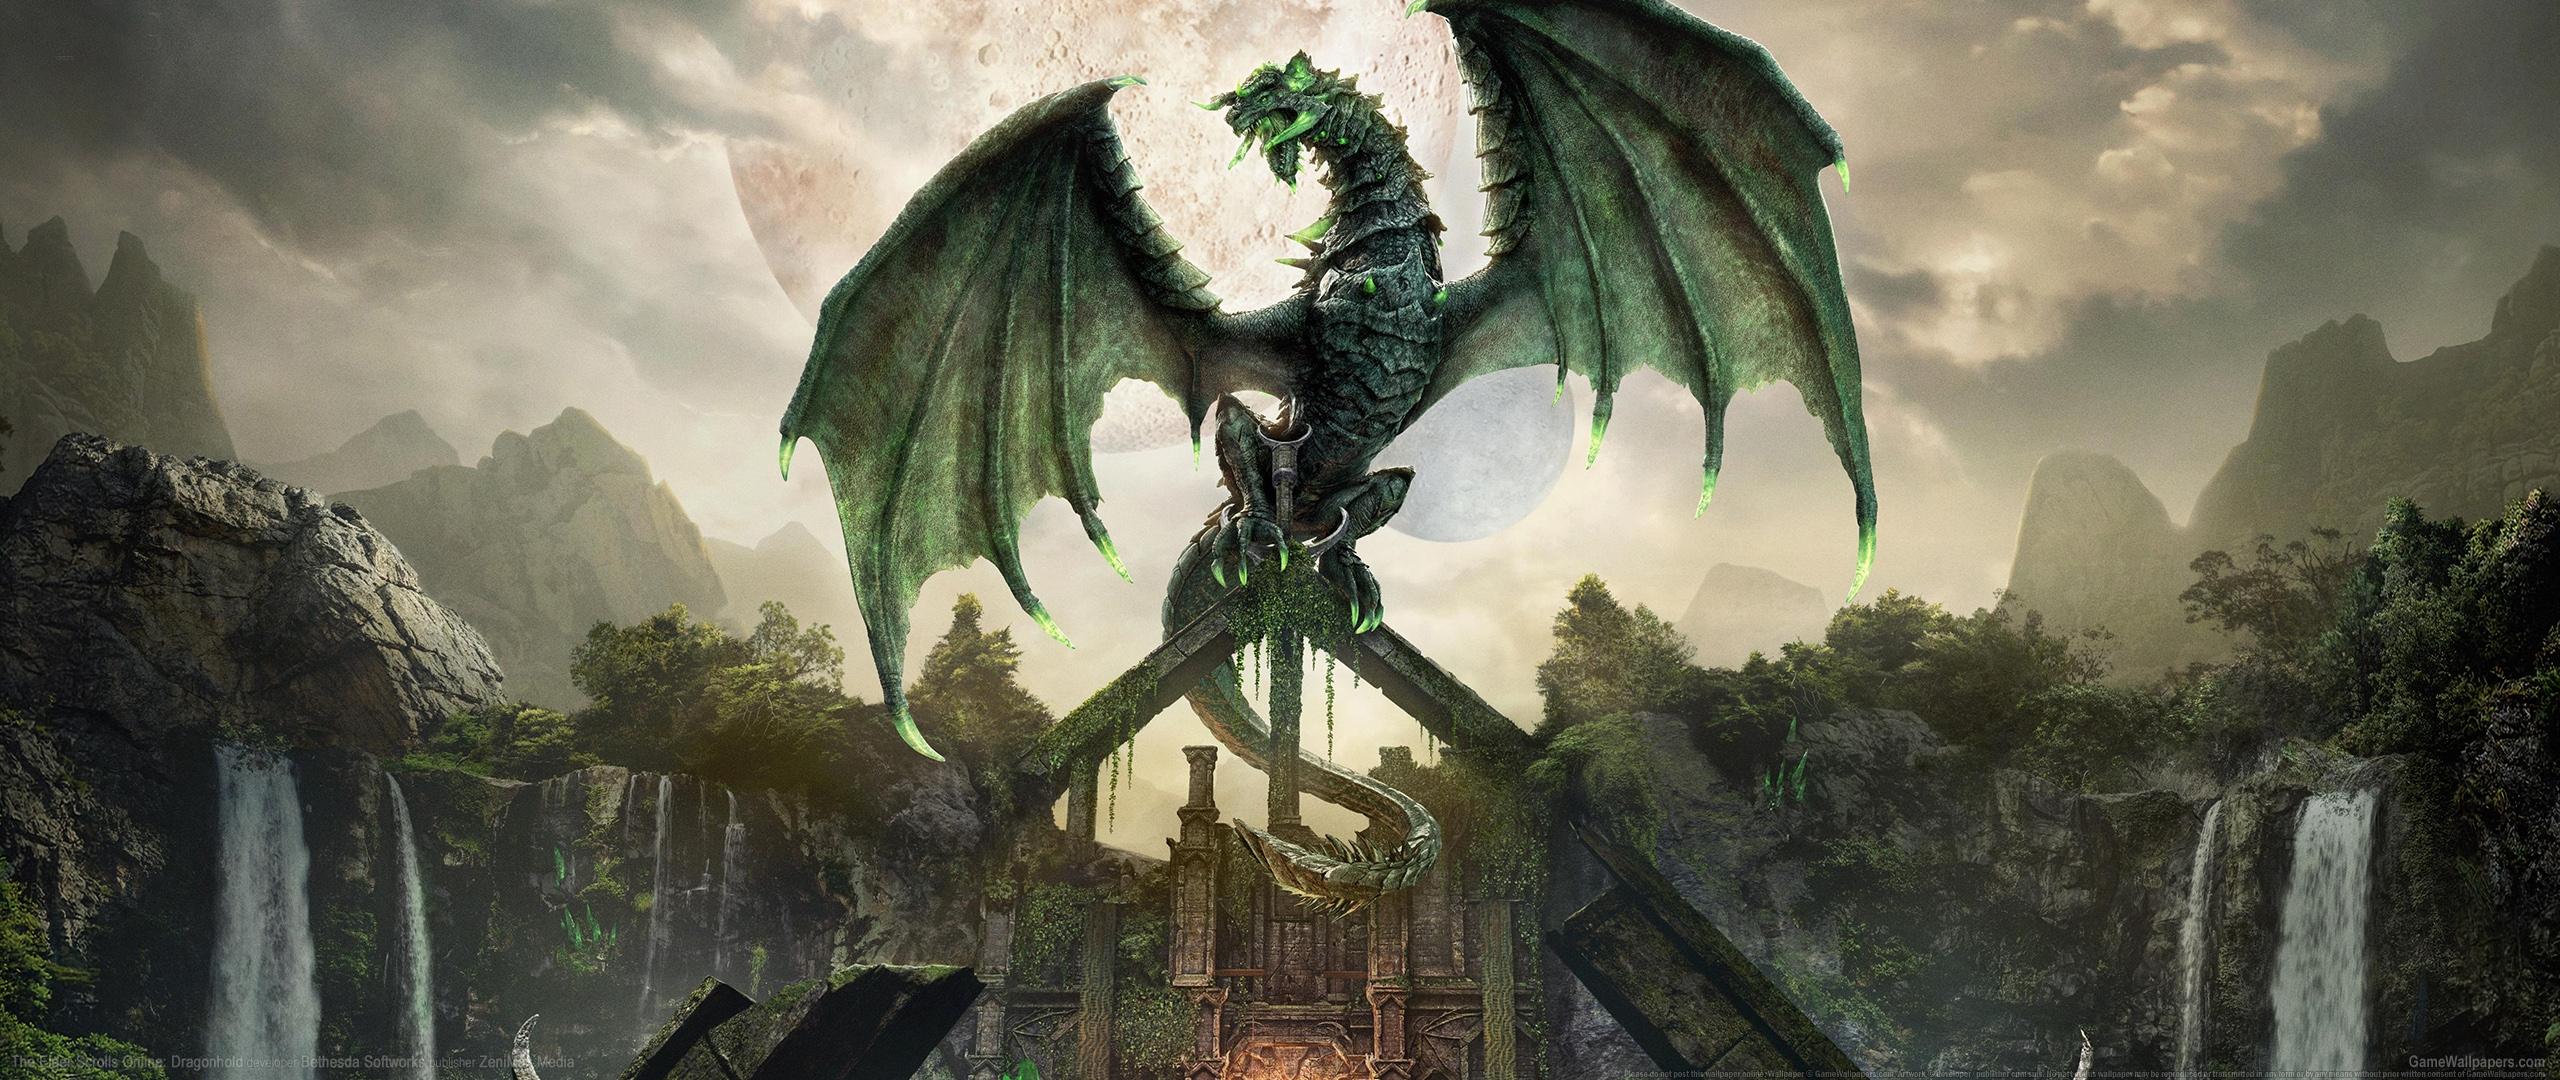 The Elder Scrolls Online: Dragonhold 2560x1080 fondo de escritorio 01